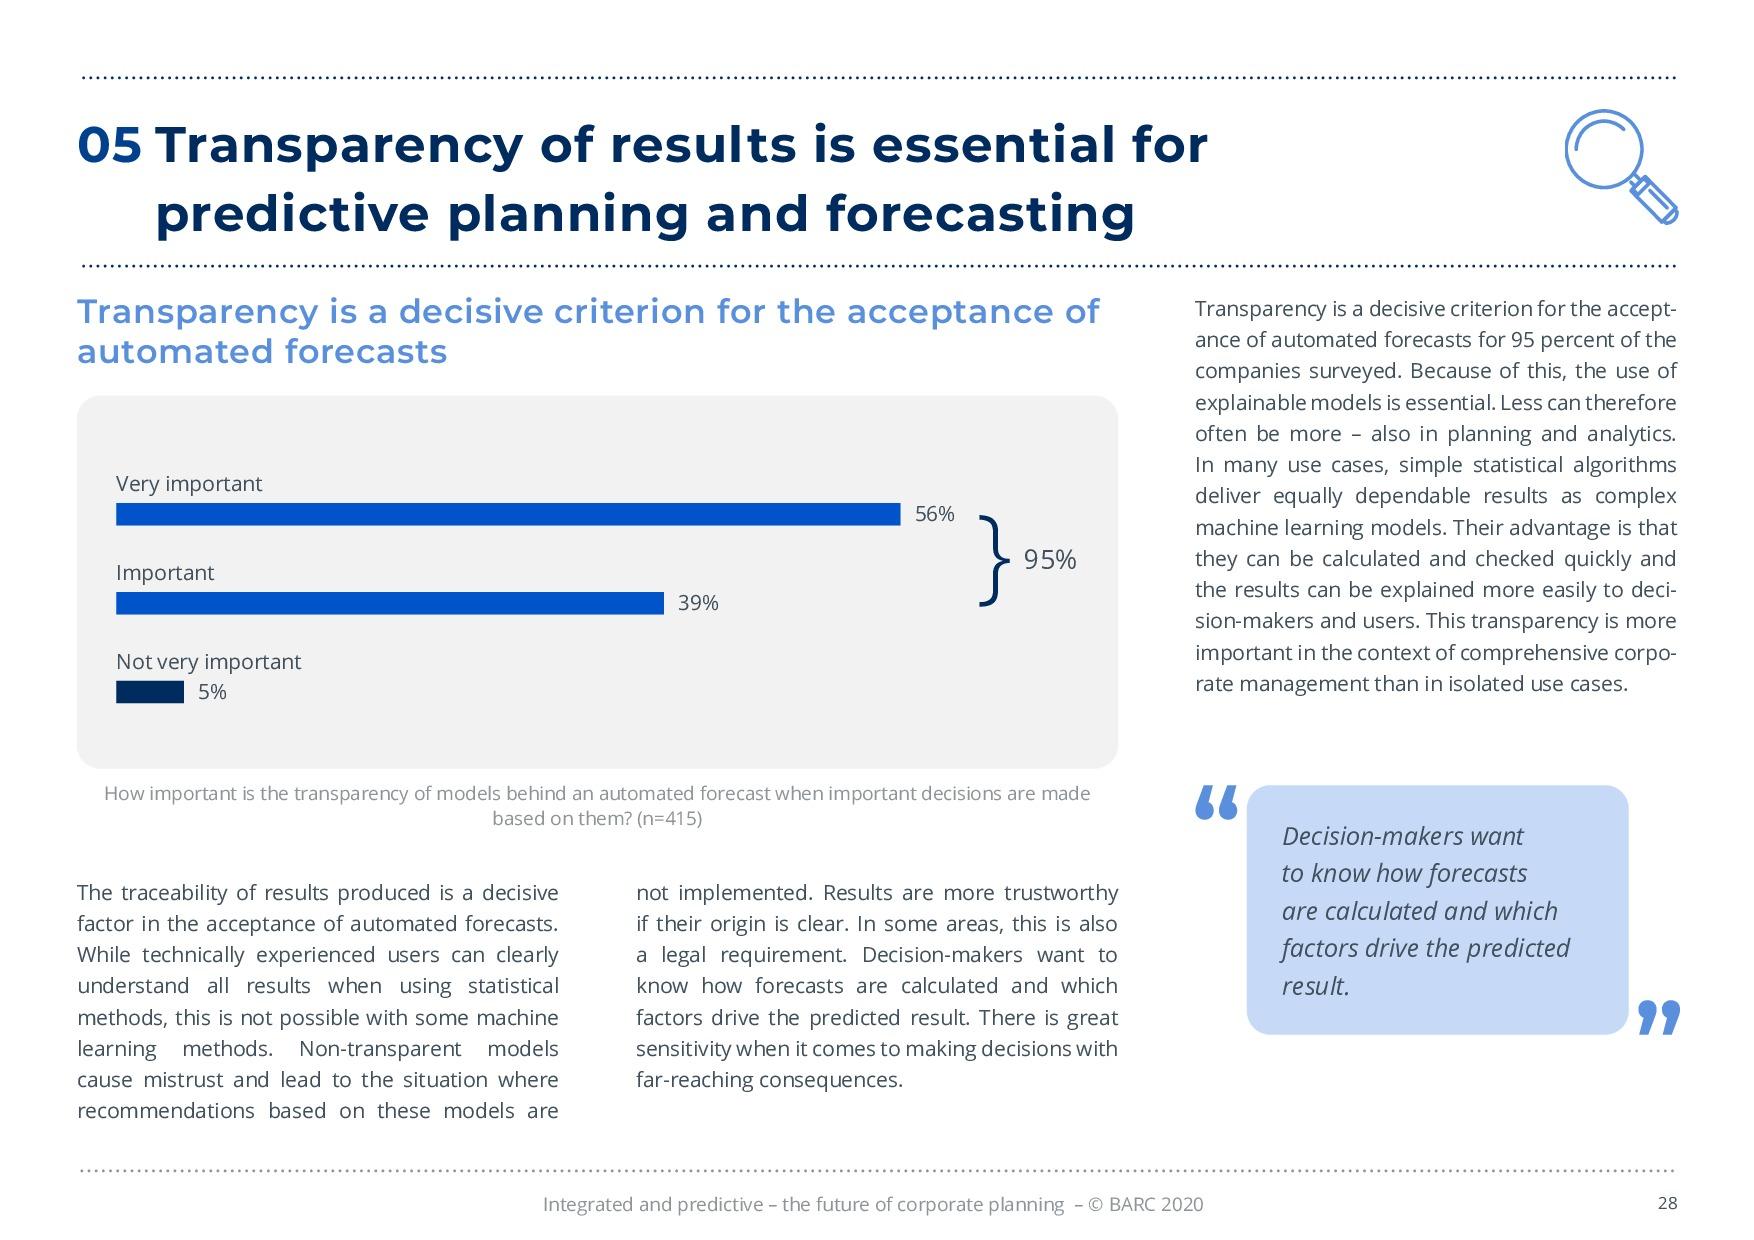 BARC – 統合と予測 – 経営計画の未来 | Page 28